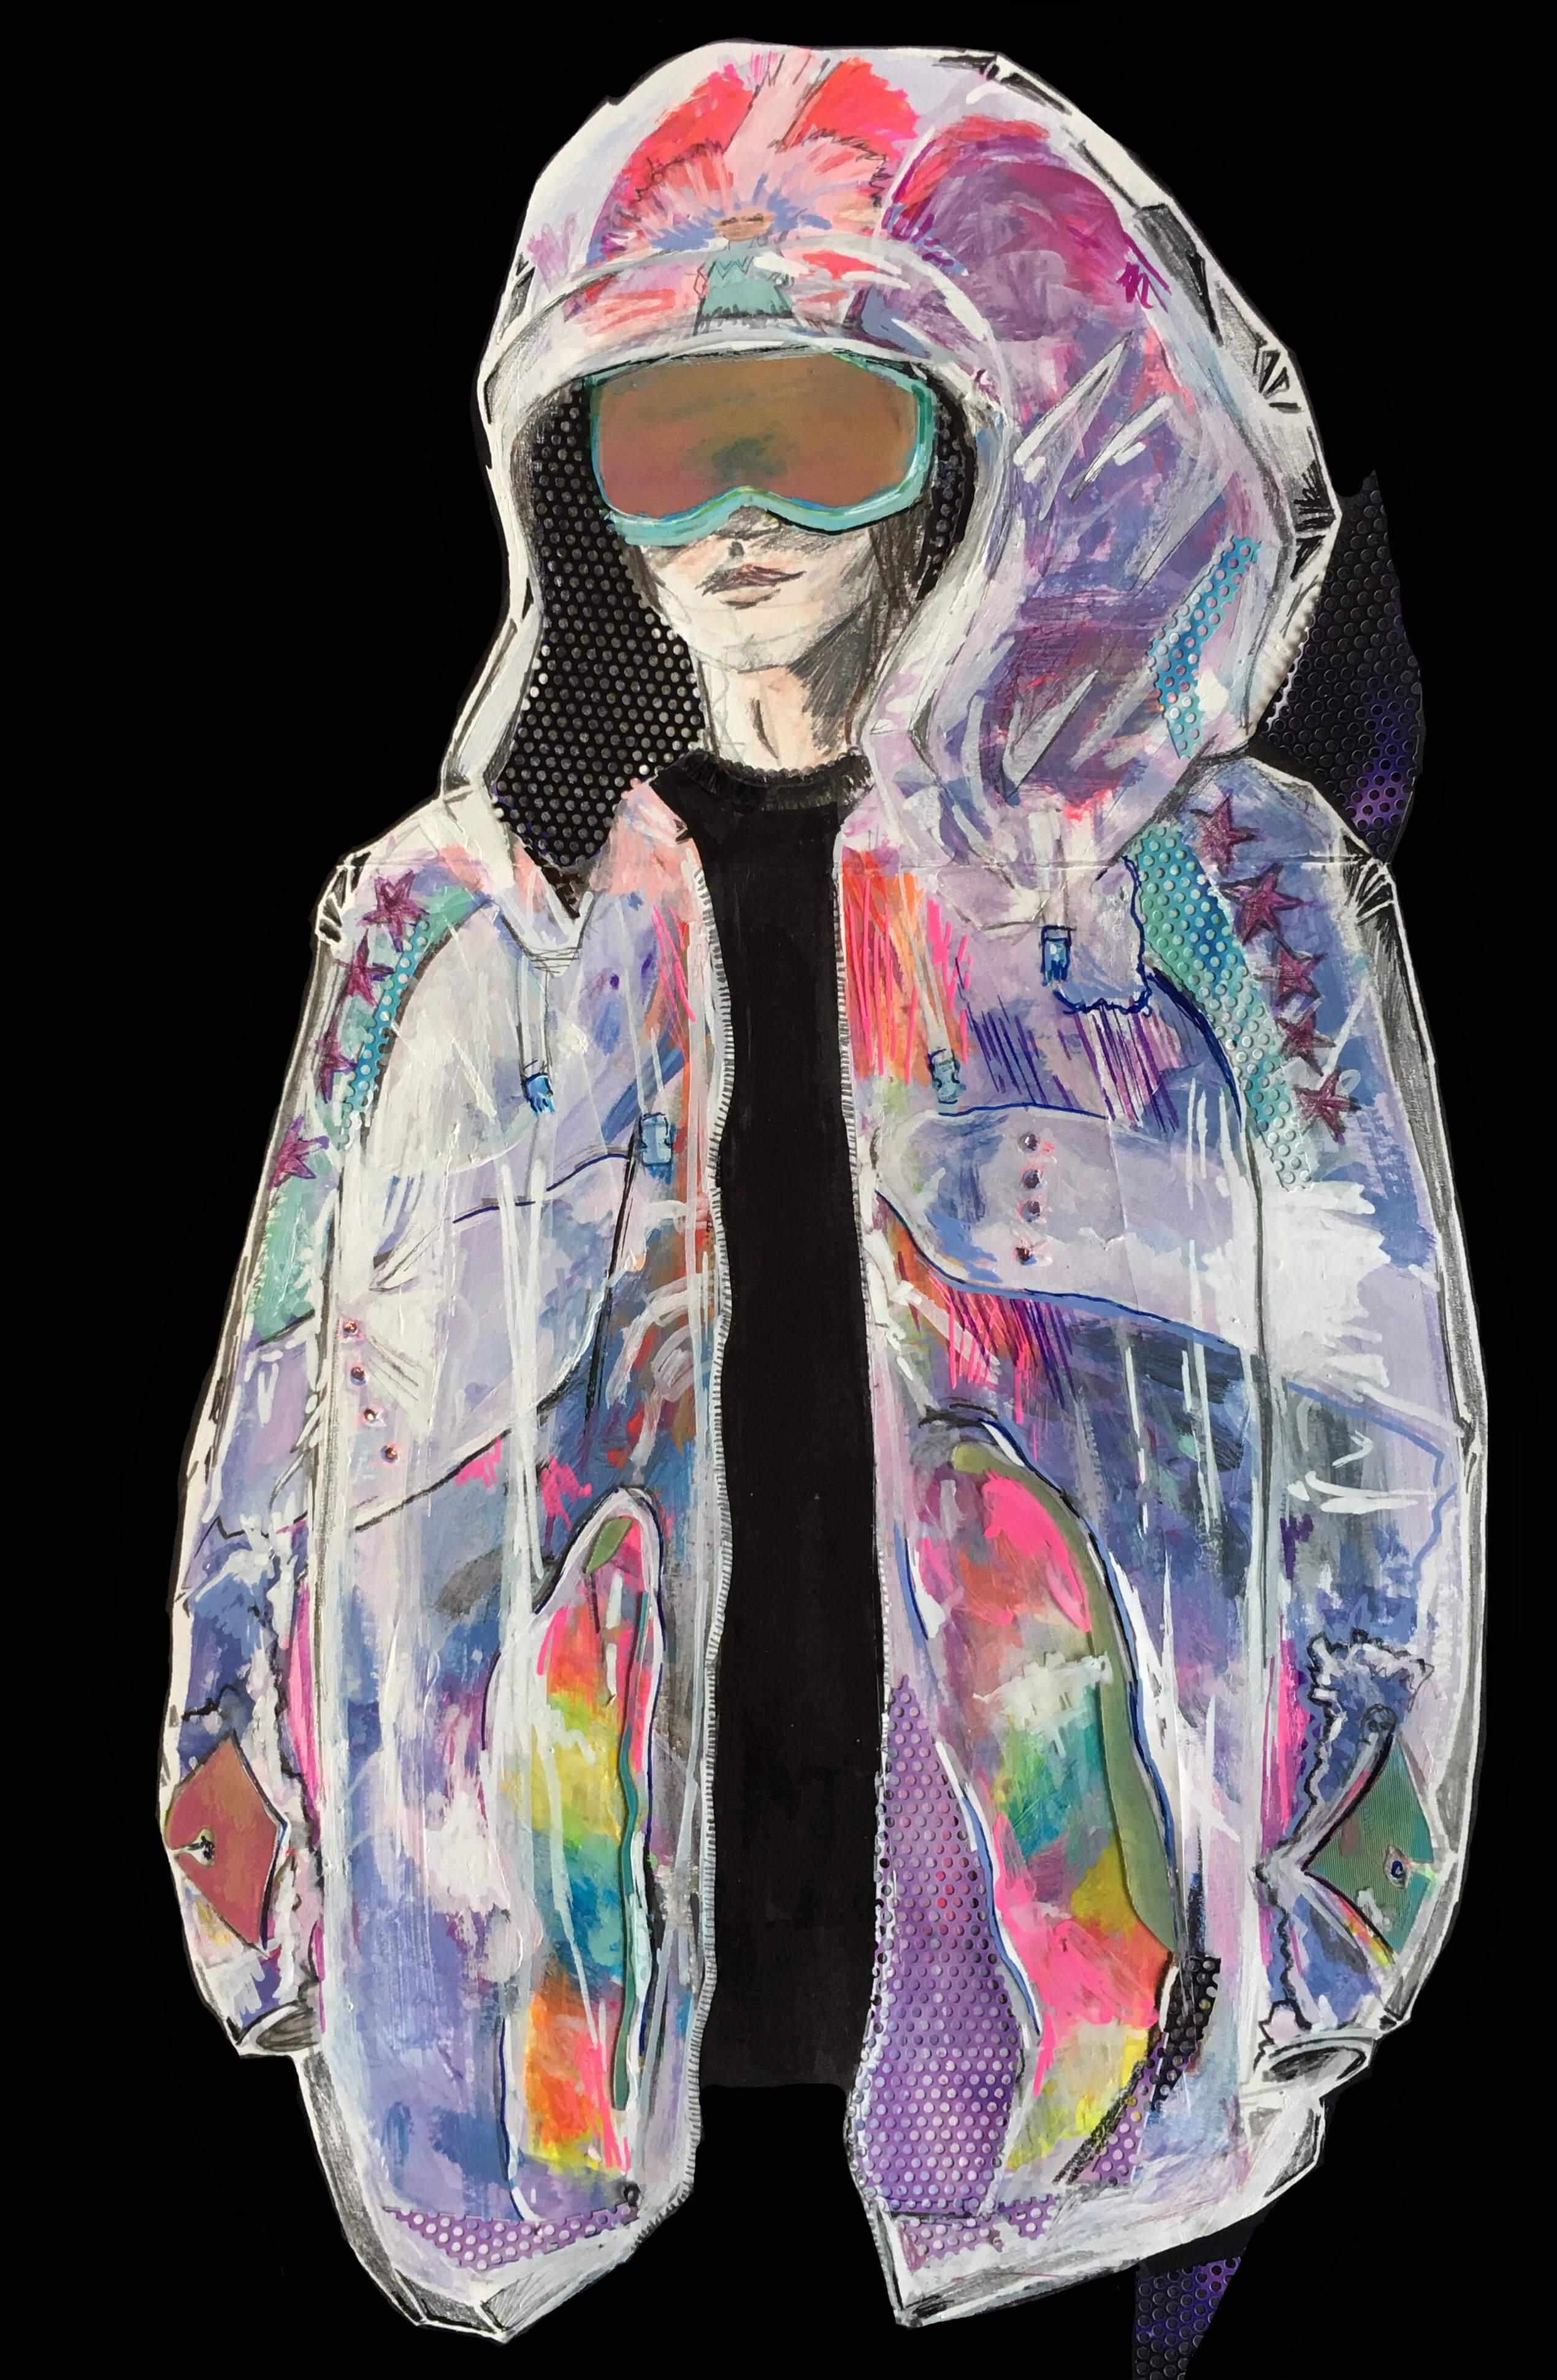 rainbowcoat